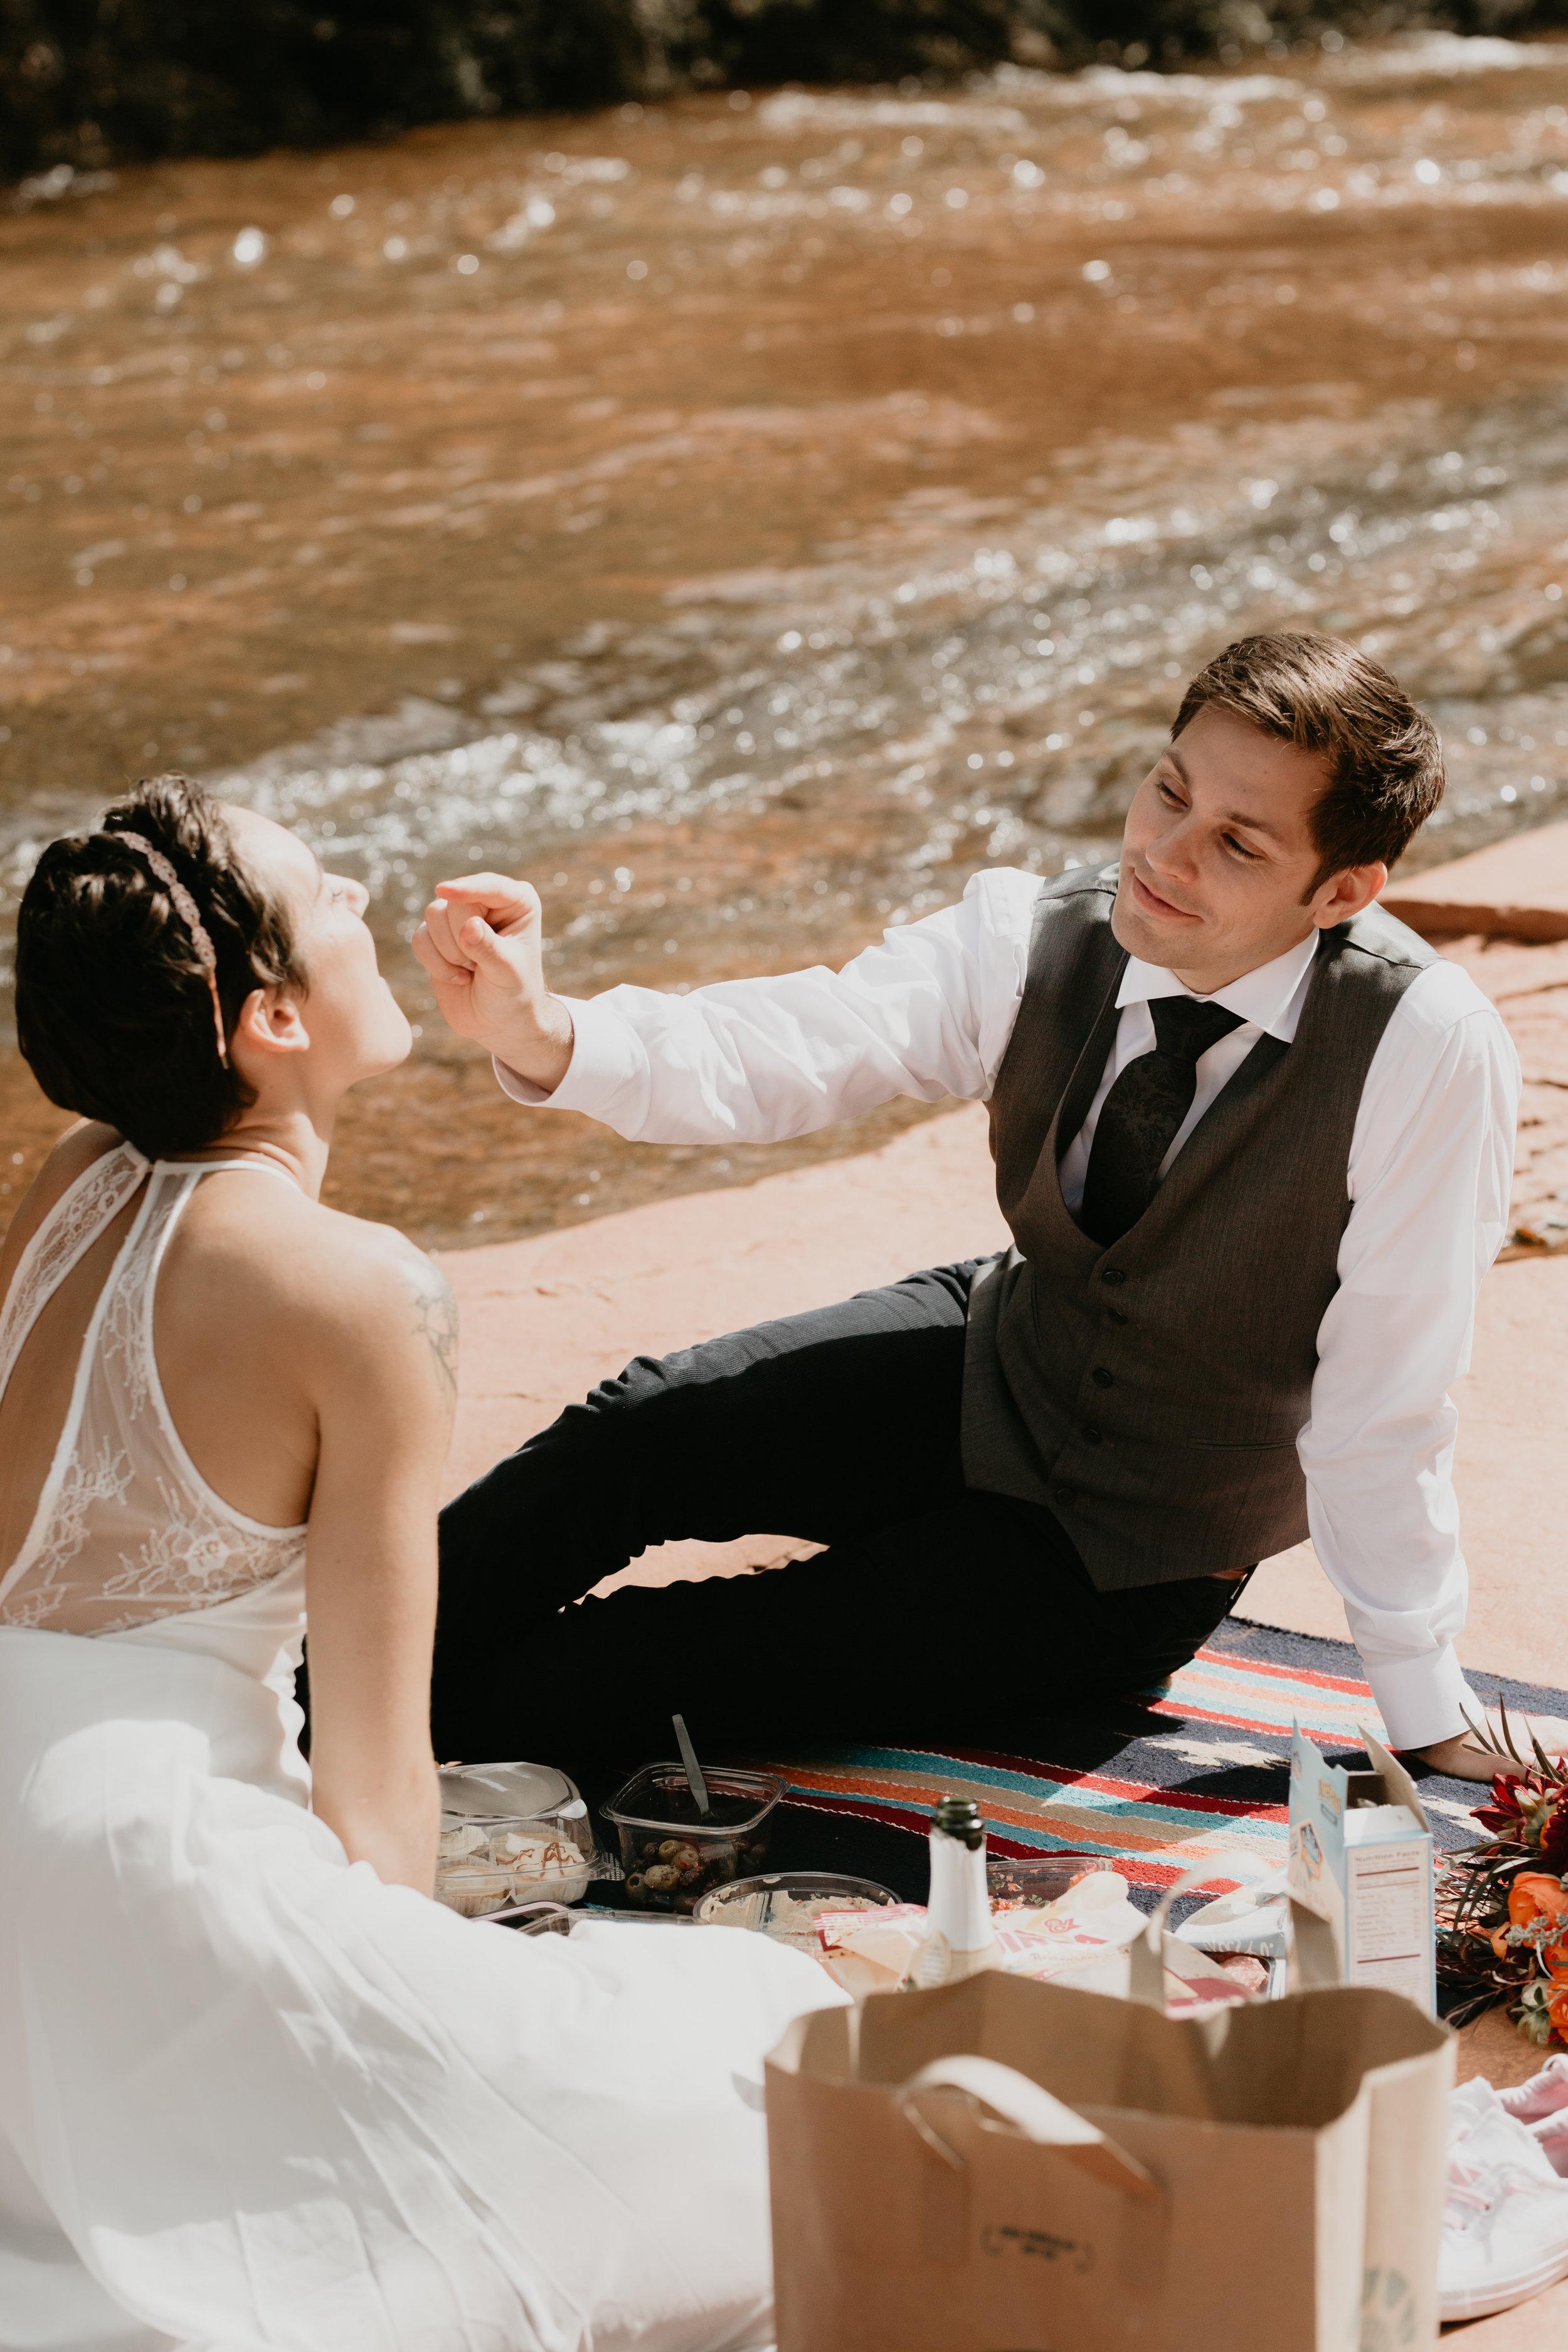 nicole-daacke-photography-sedona-arizona-destination-elopement-wedding-photographer-catherdral-rock-hiking-elopement-sedona-river-elopement-photos-desert-rock-wedding-photographer-laid-back-spontaneous-elopement-102.jpg